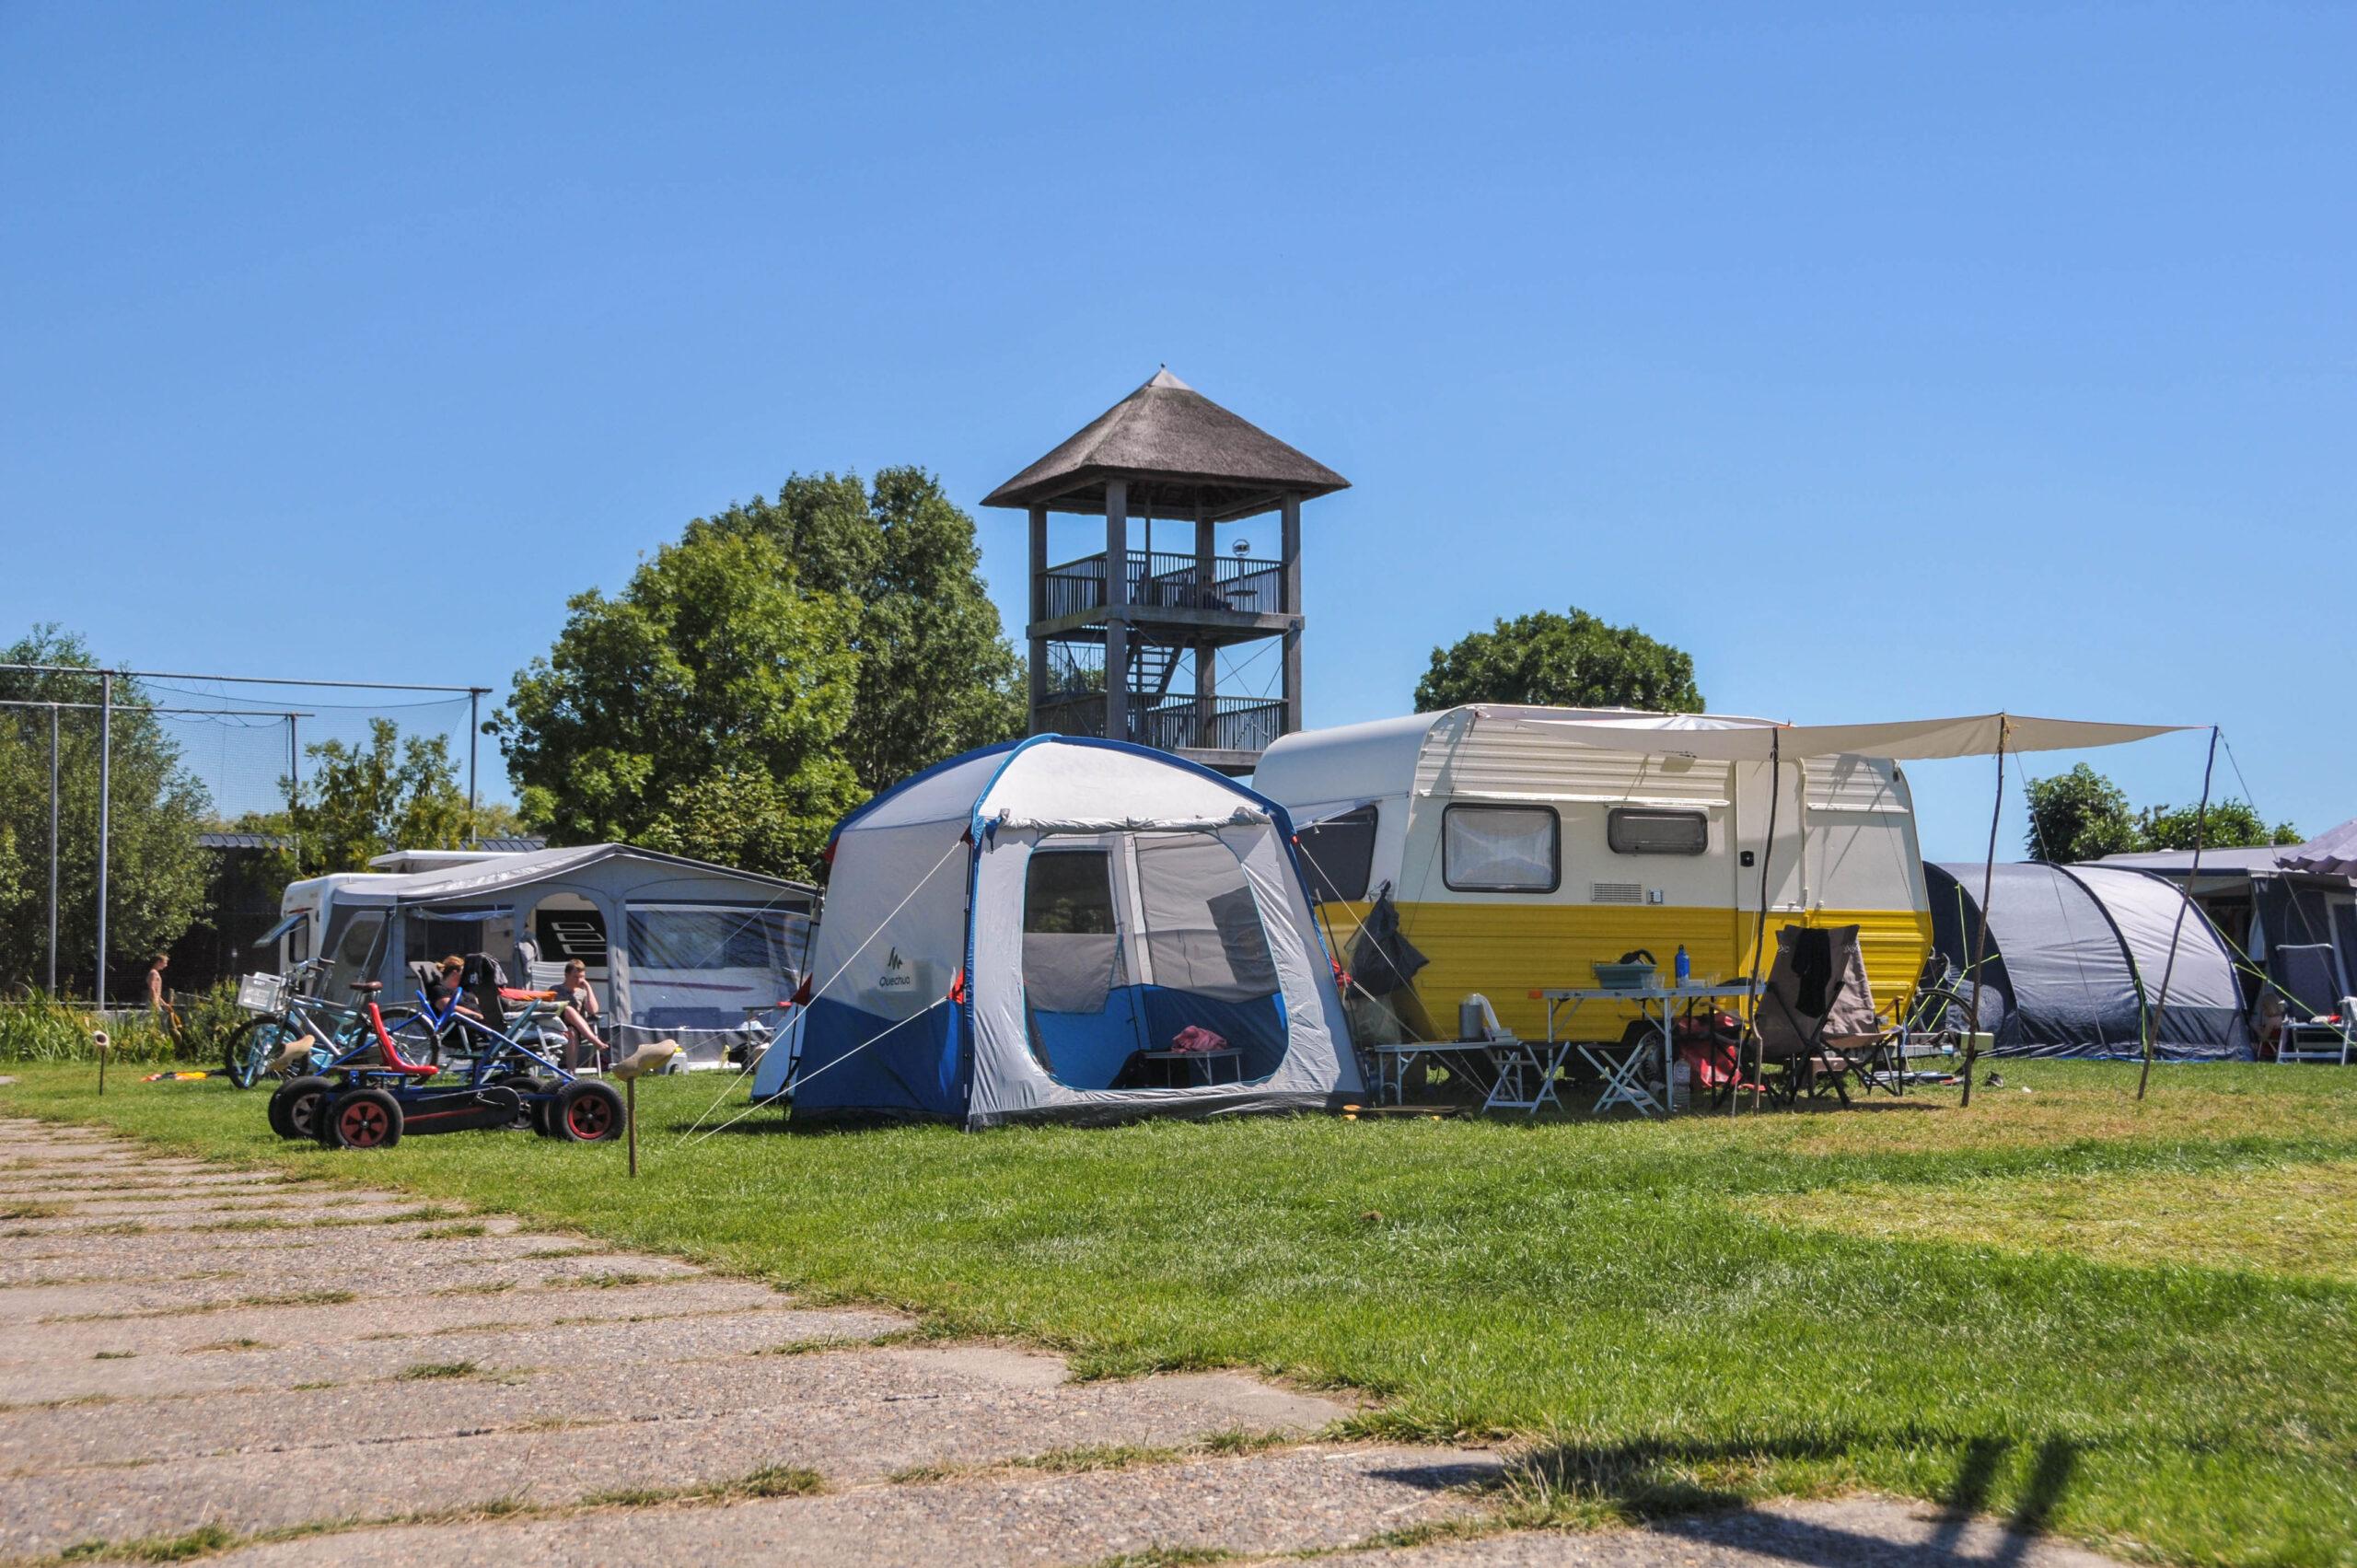 Omgeving | Camping de Boerinn